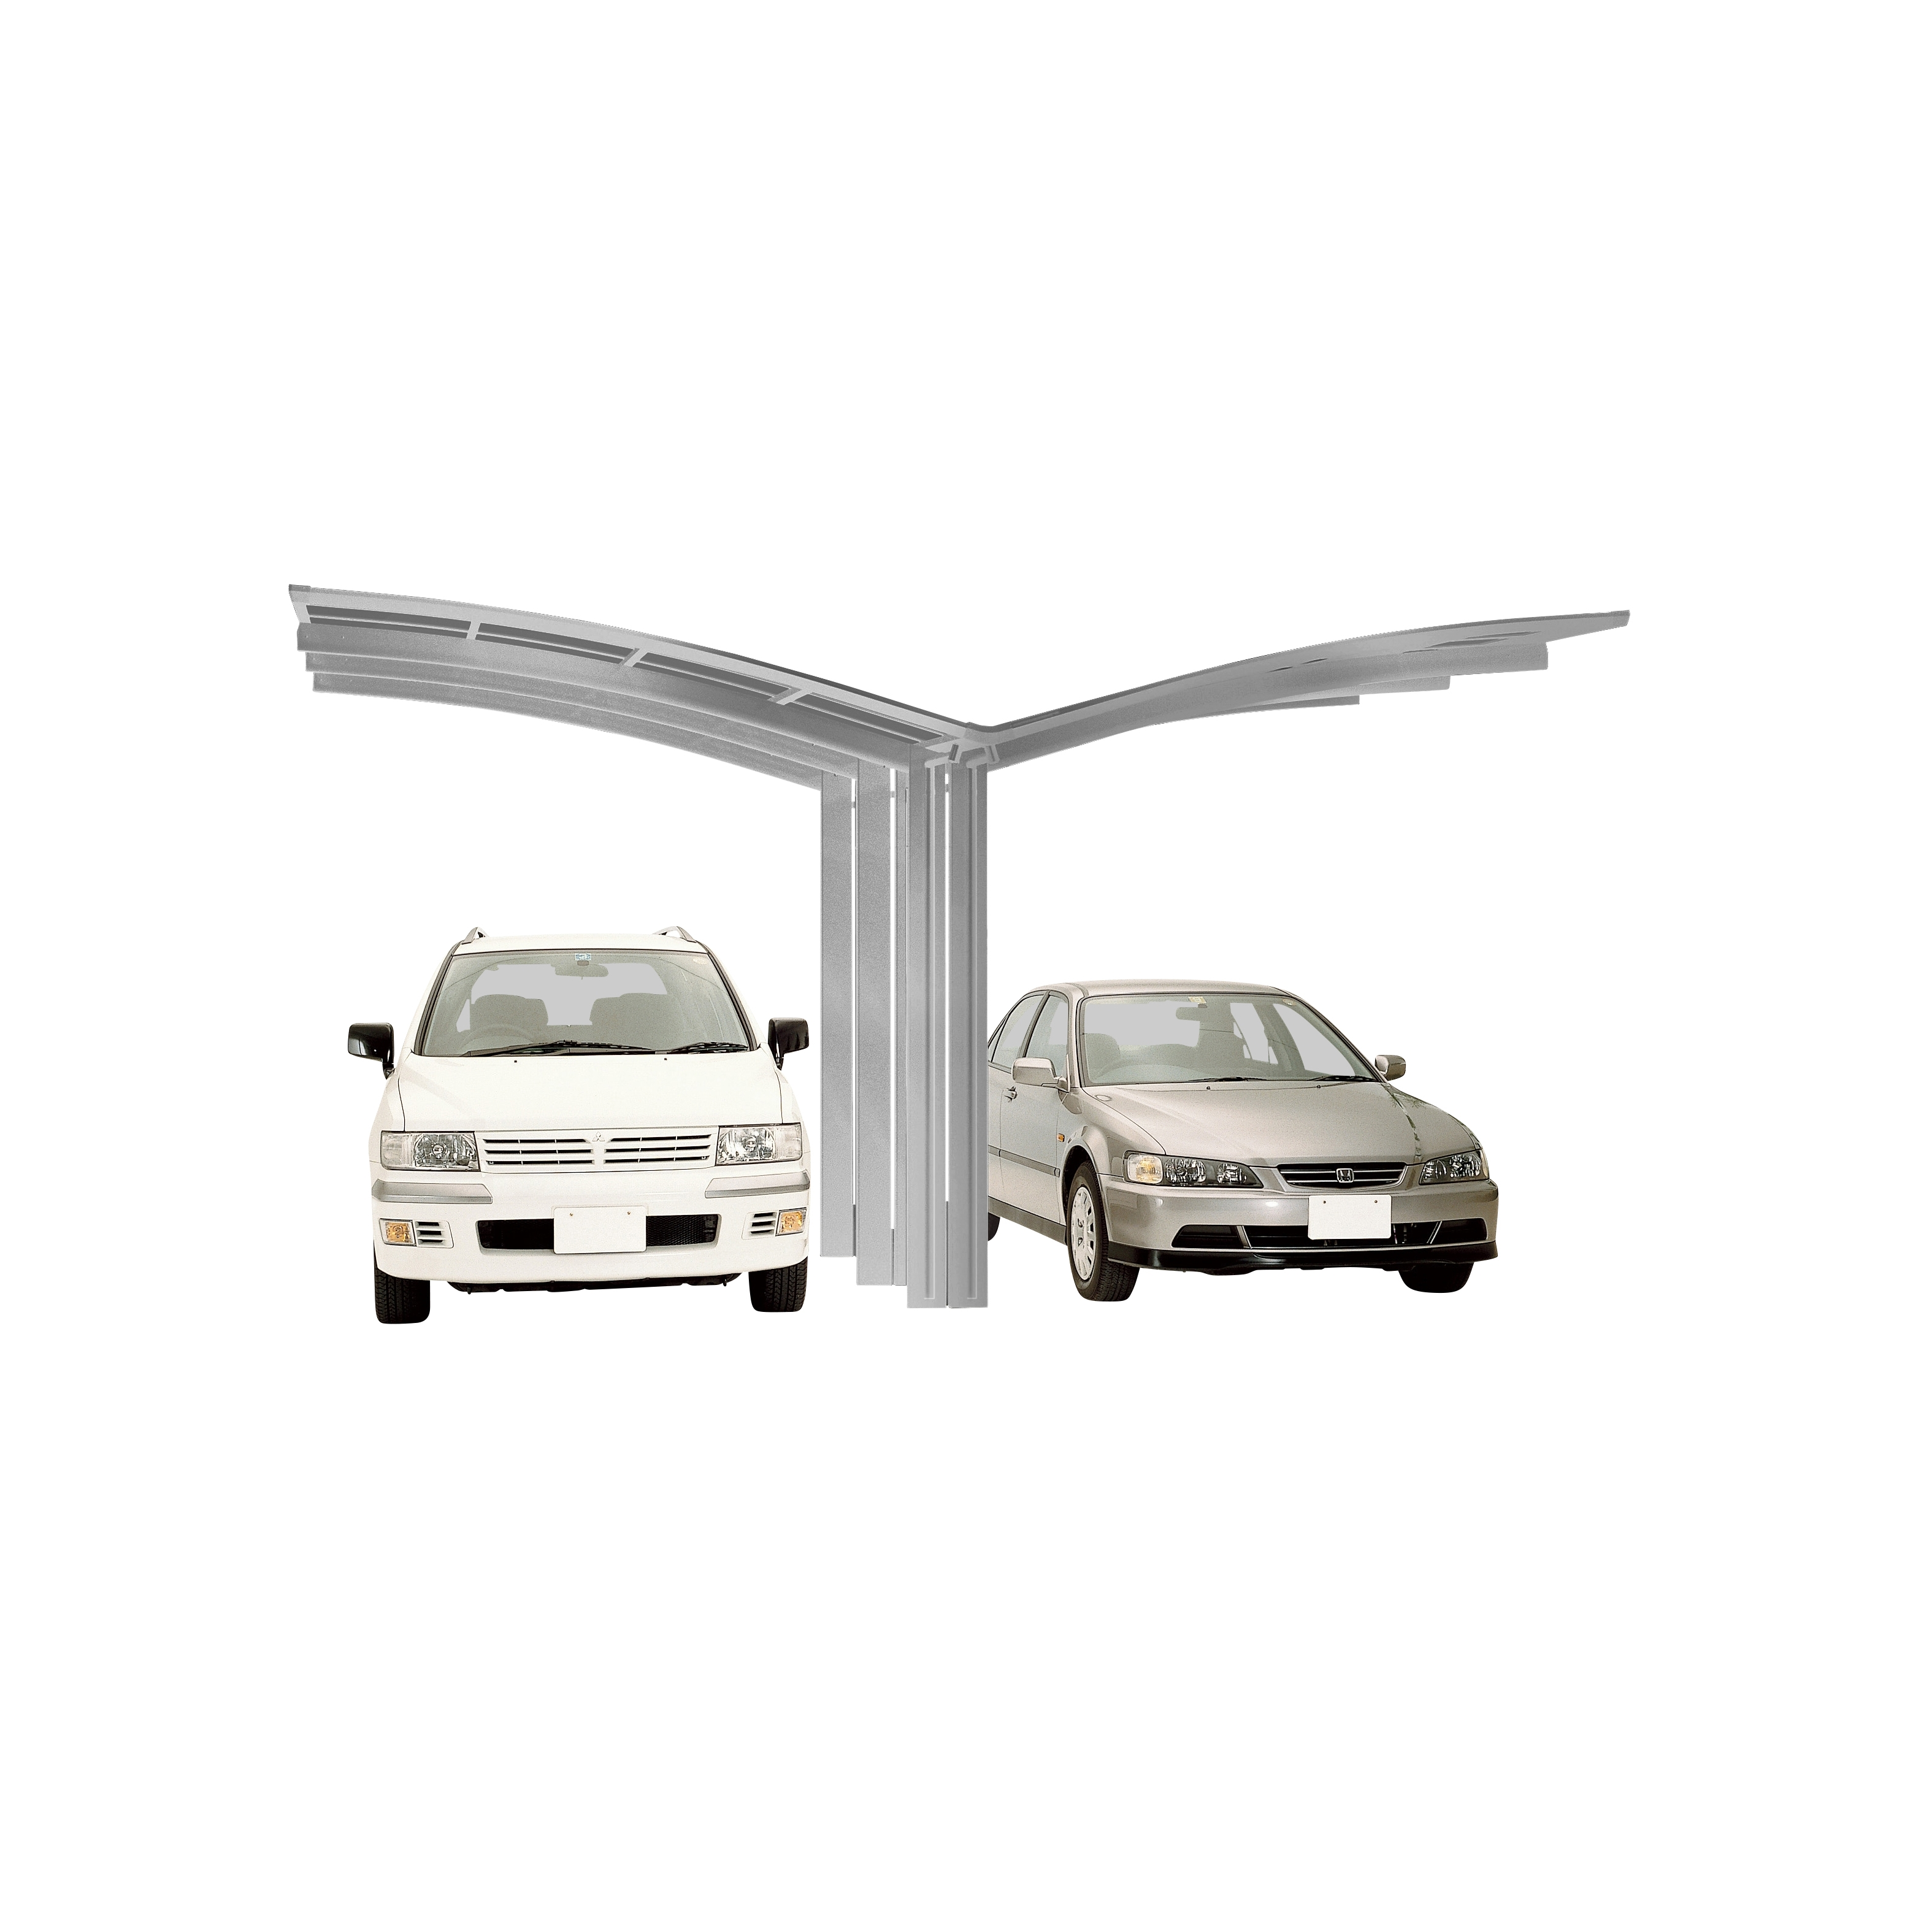 Carport XIMAX Portoforte Alu Typ 110 Y ES 495x543x248cm Bild 1